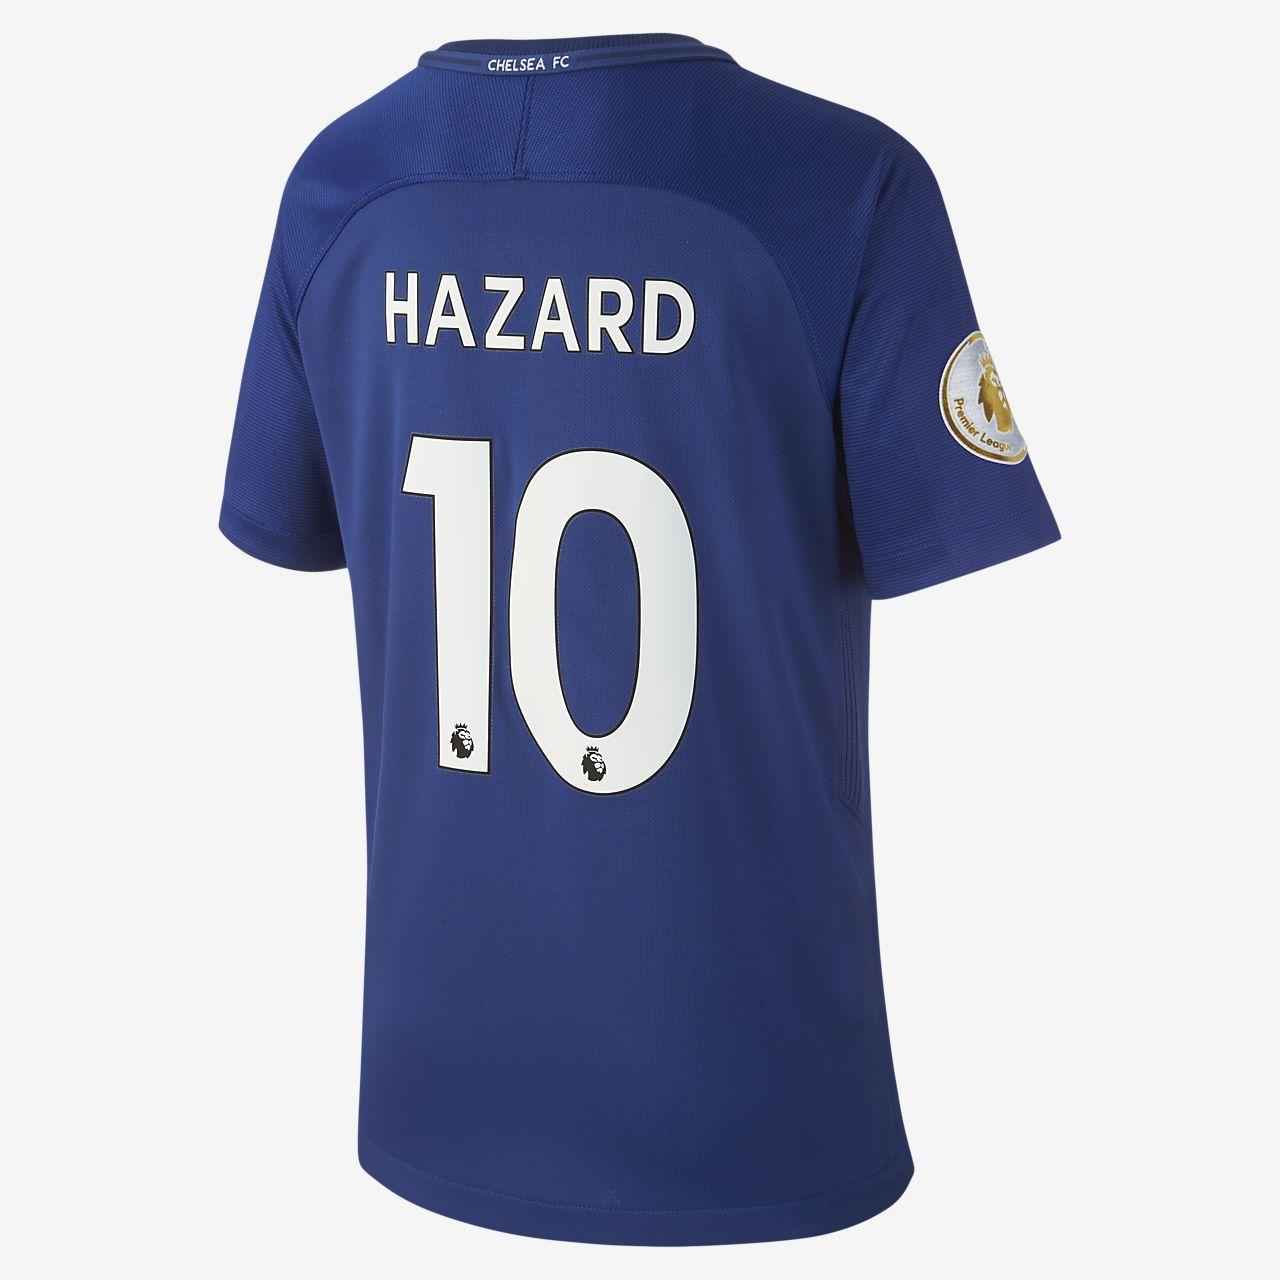 more photos cec08 39ac0 2017/18 Chelsea FC Stadium Home (Eden Hazard) Older Kids' Football Shirt